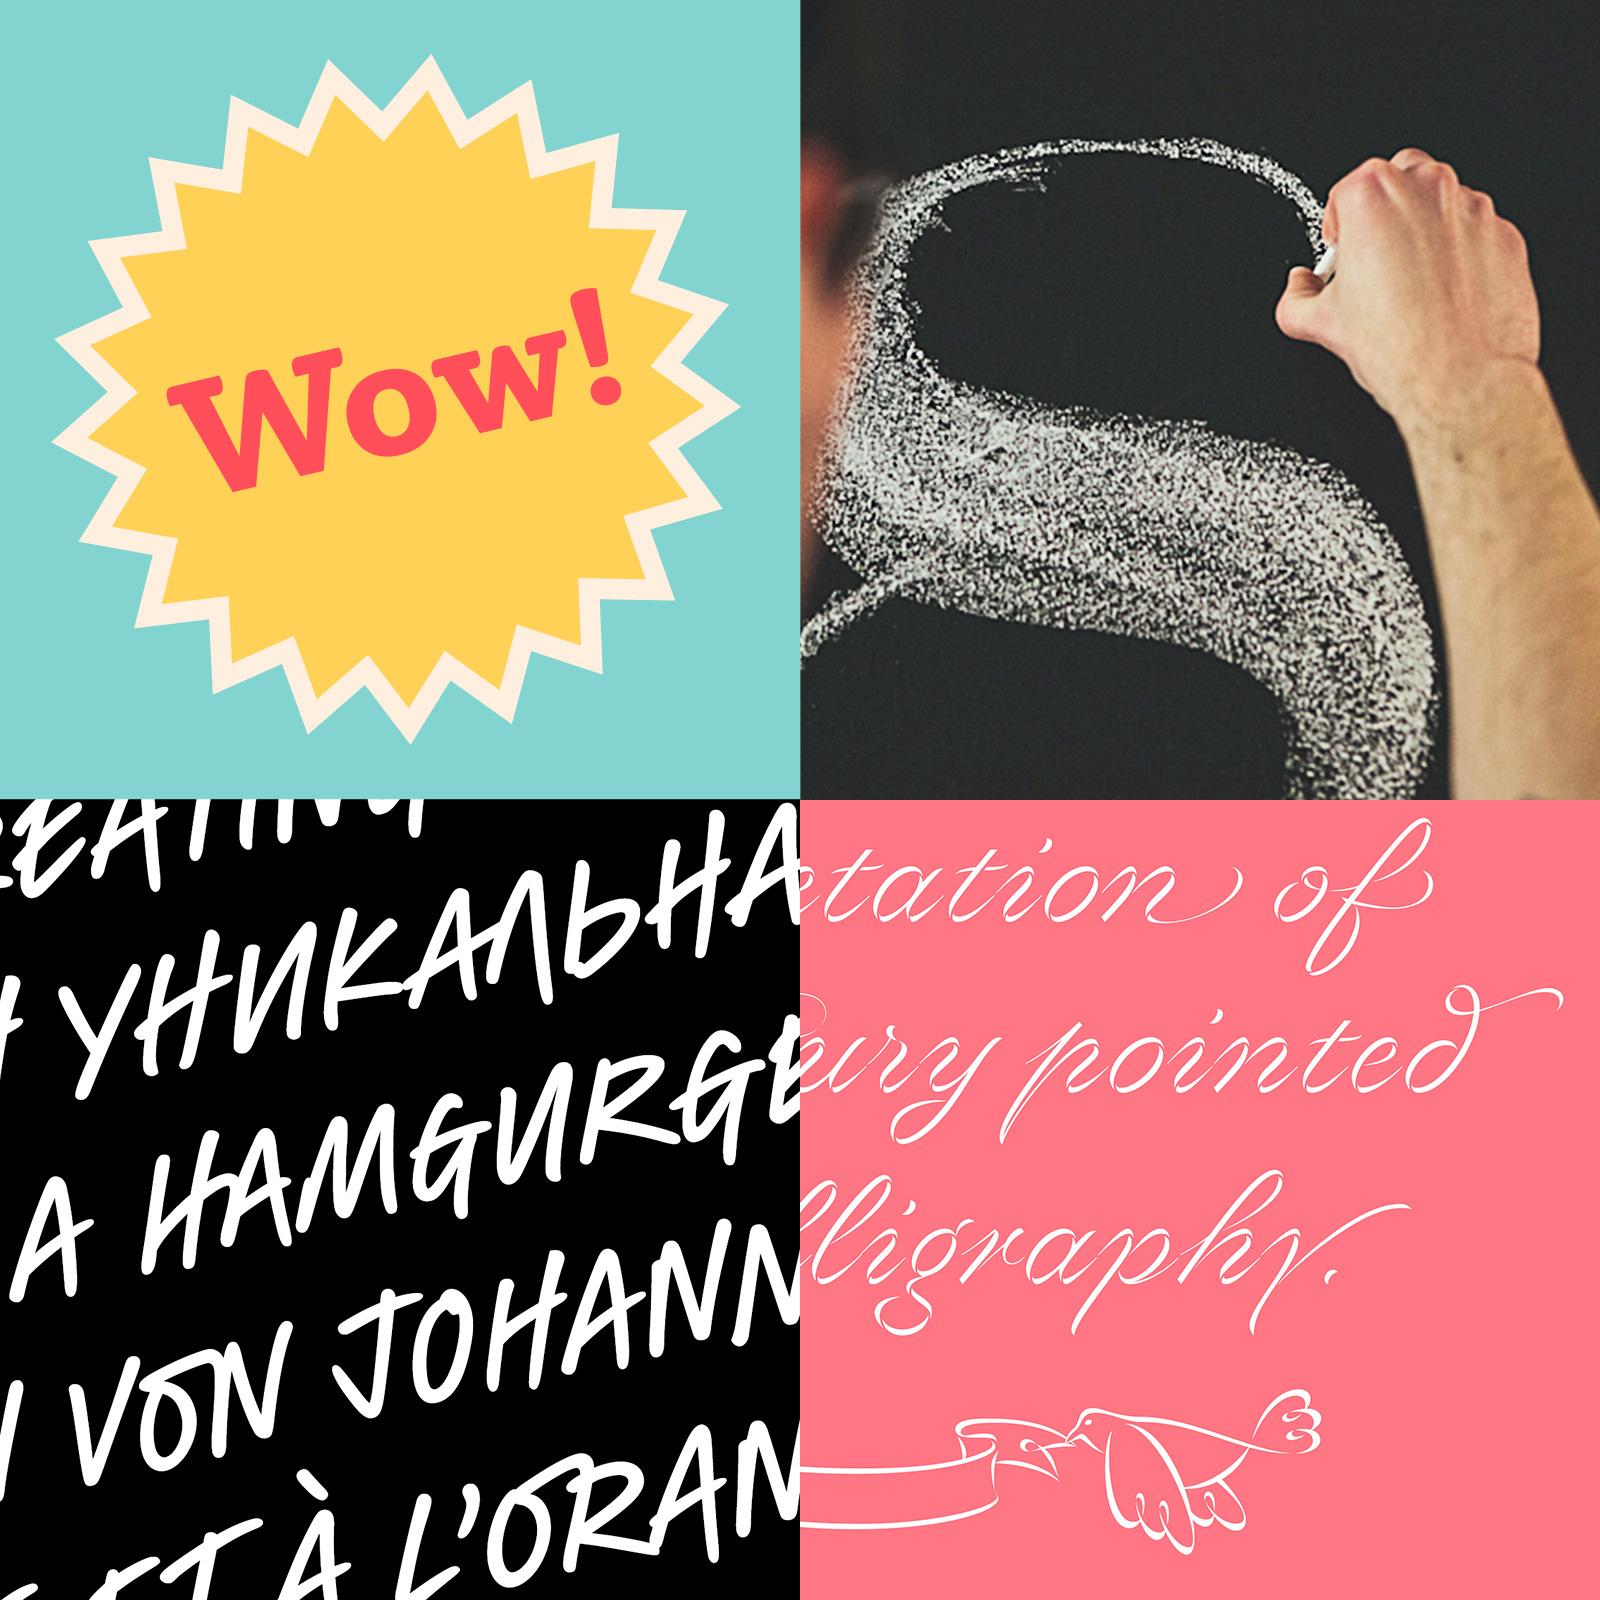 thur_22nd_10am5pm_brdisplay_typeface_workshop_dalton_maag